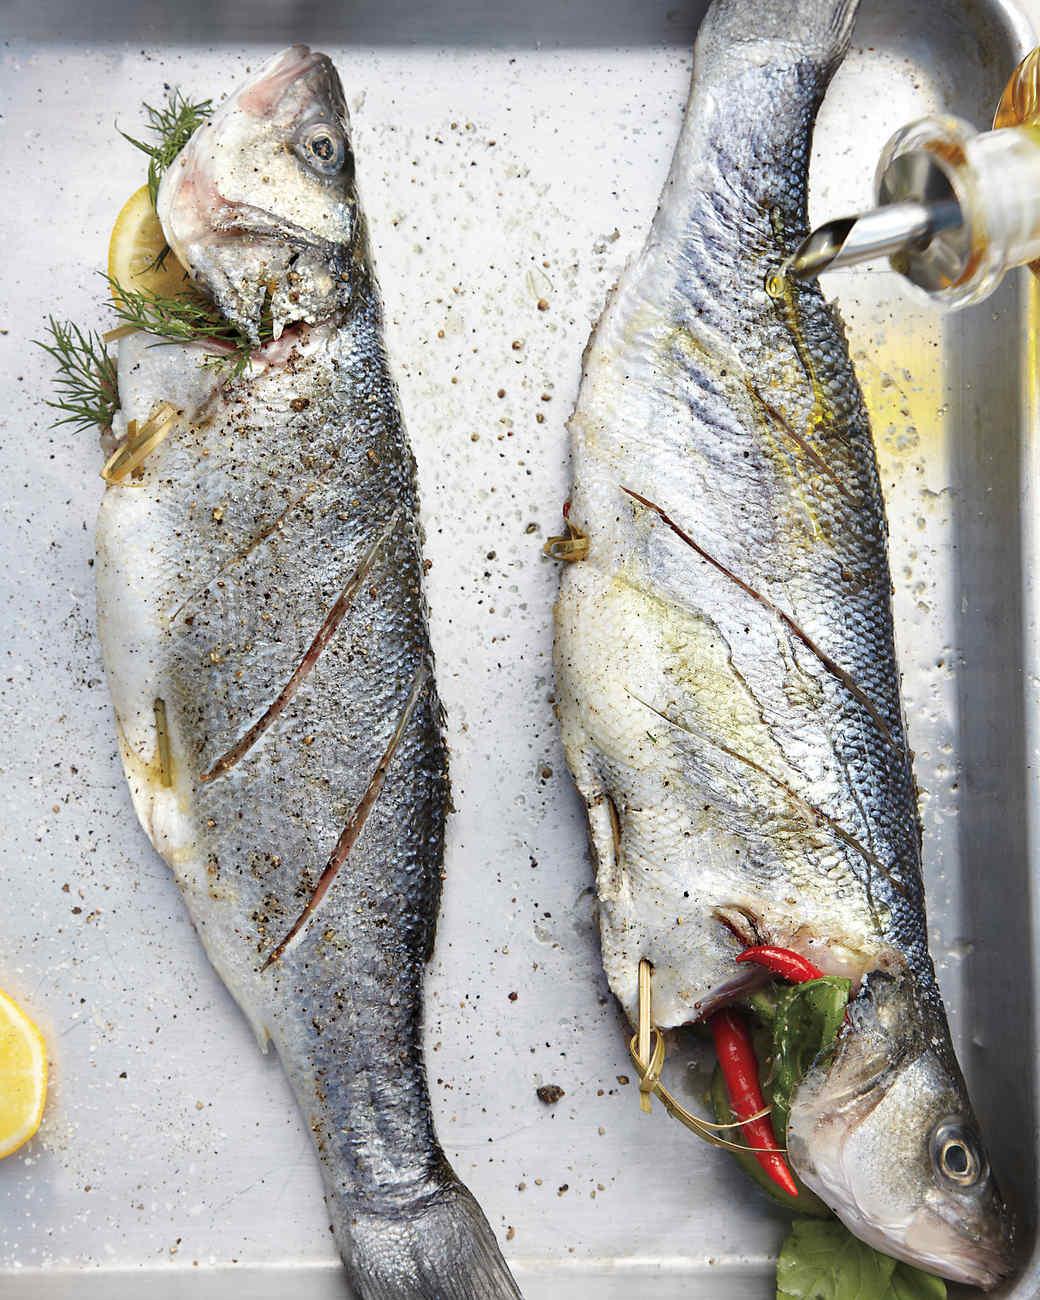 grilled-fish-5-mld110112.jpg